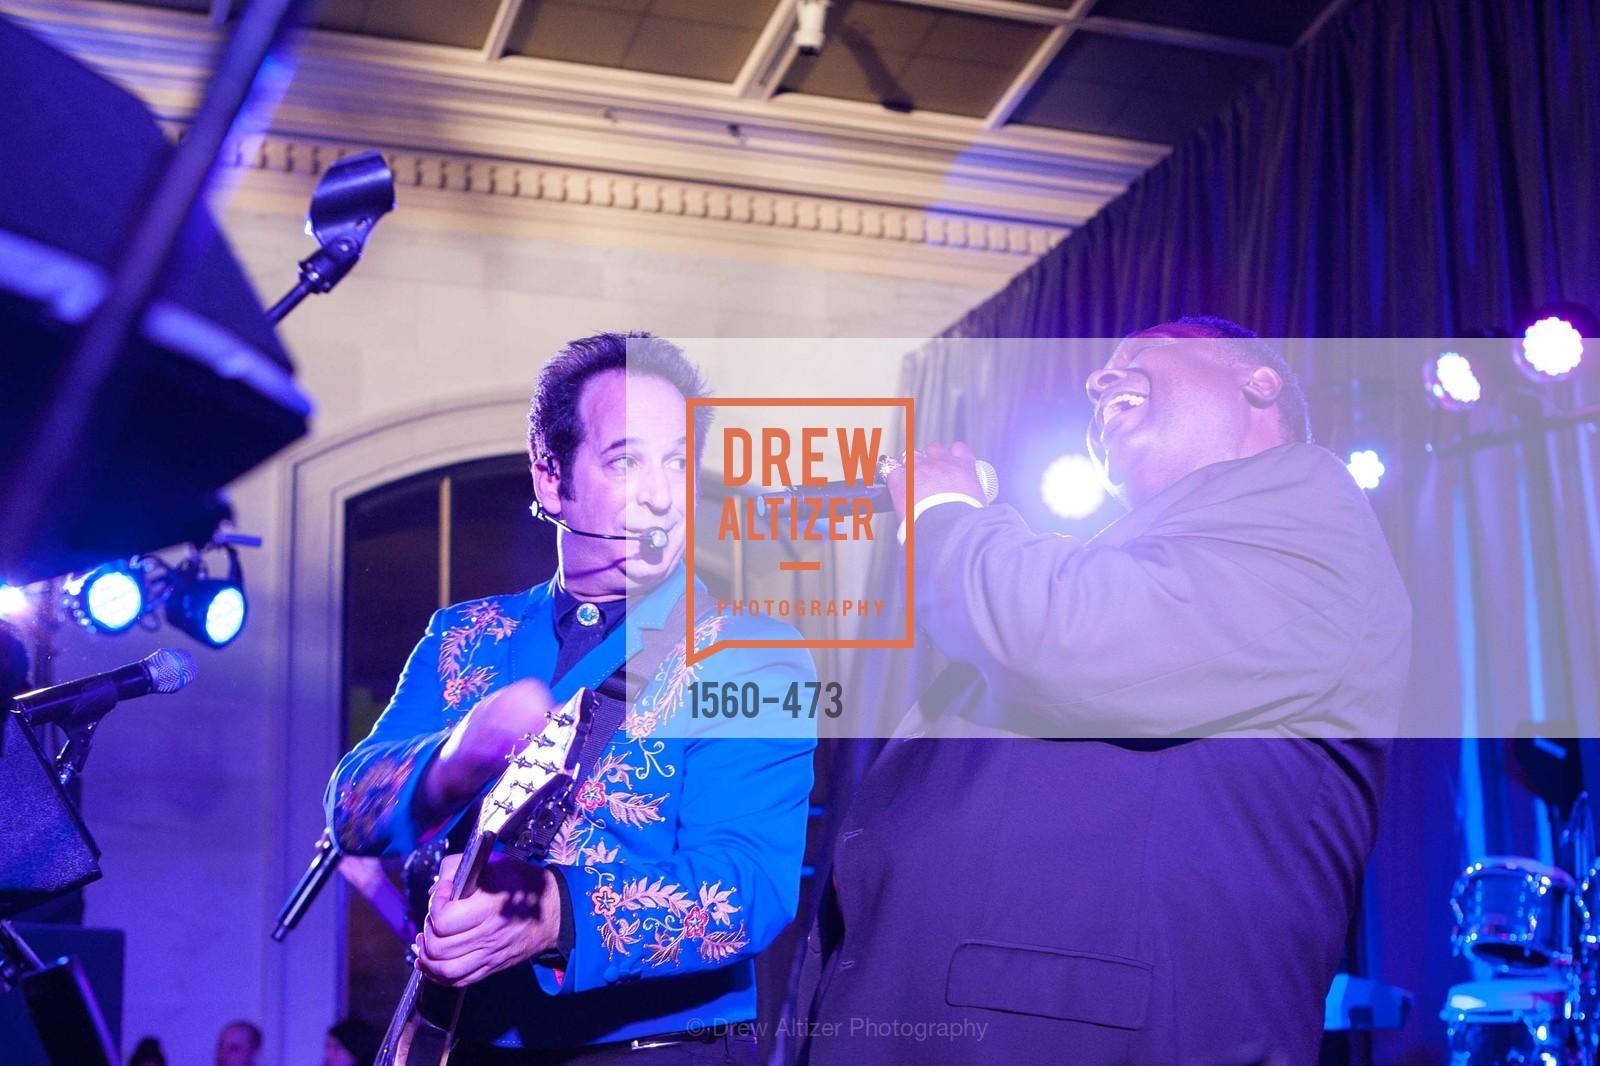 Performance, ENCORE! at San Francisco BALLET'S 2014 Season Opening Night Gala, US. US, January 22nd, 2014,Drew Altizer, Drew Altizer Photography, full-service event agency, private events, San Francisco photographer, photographer California